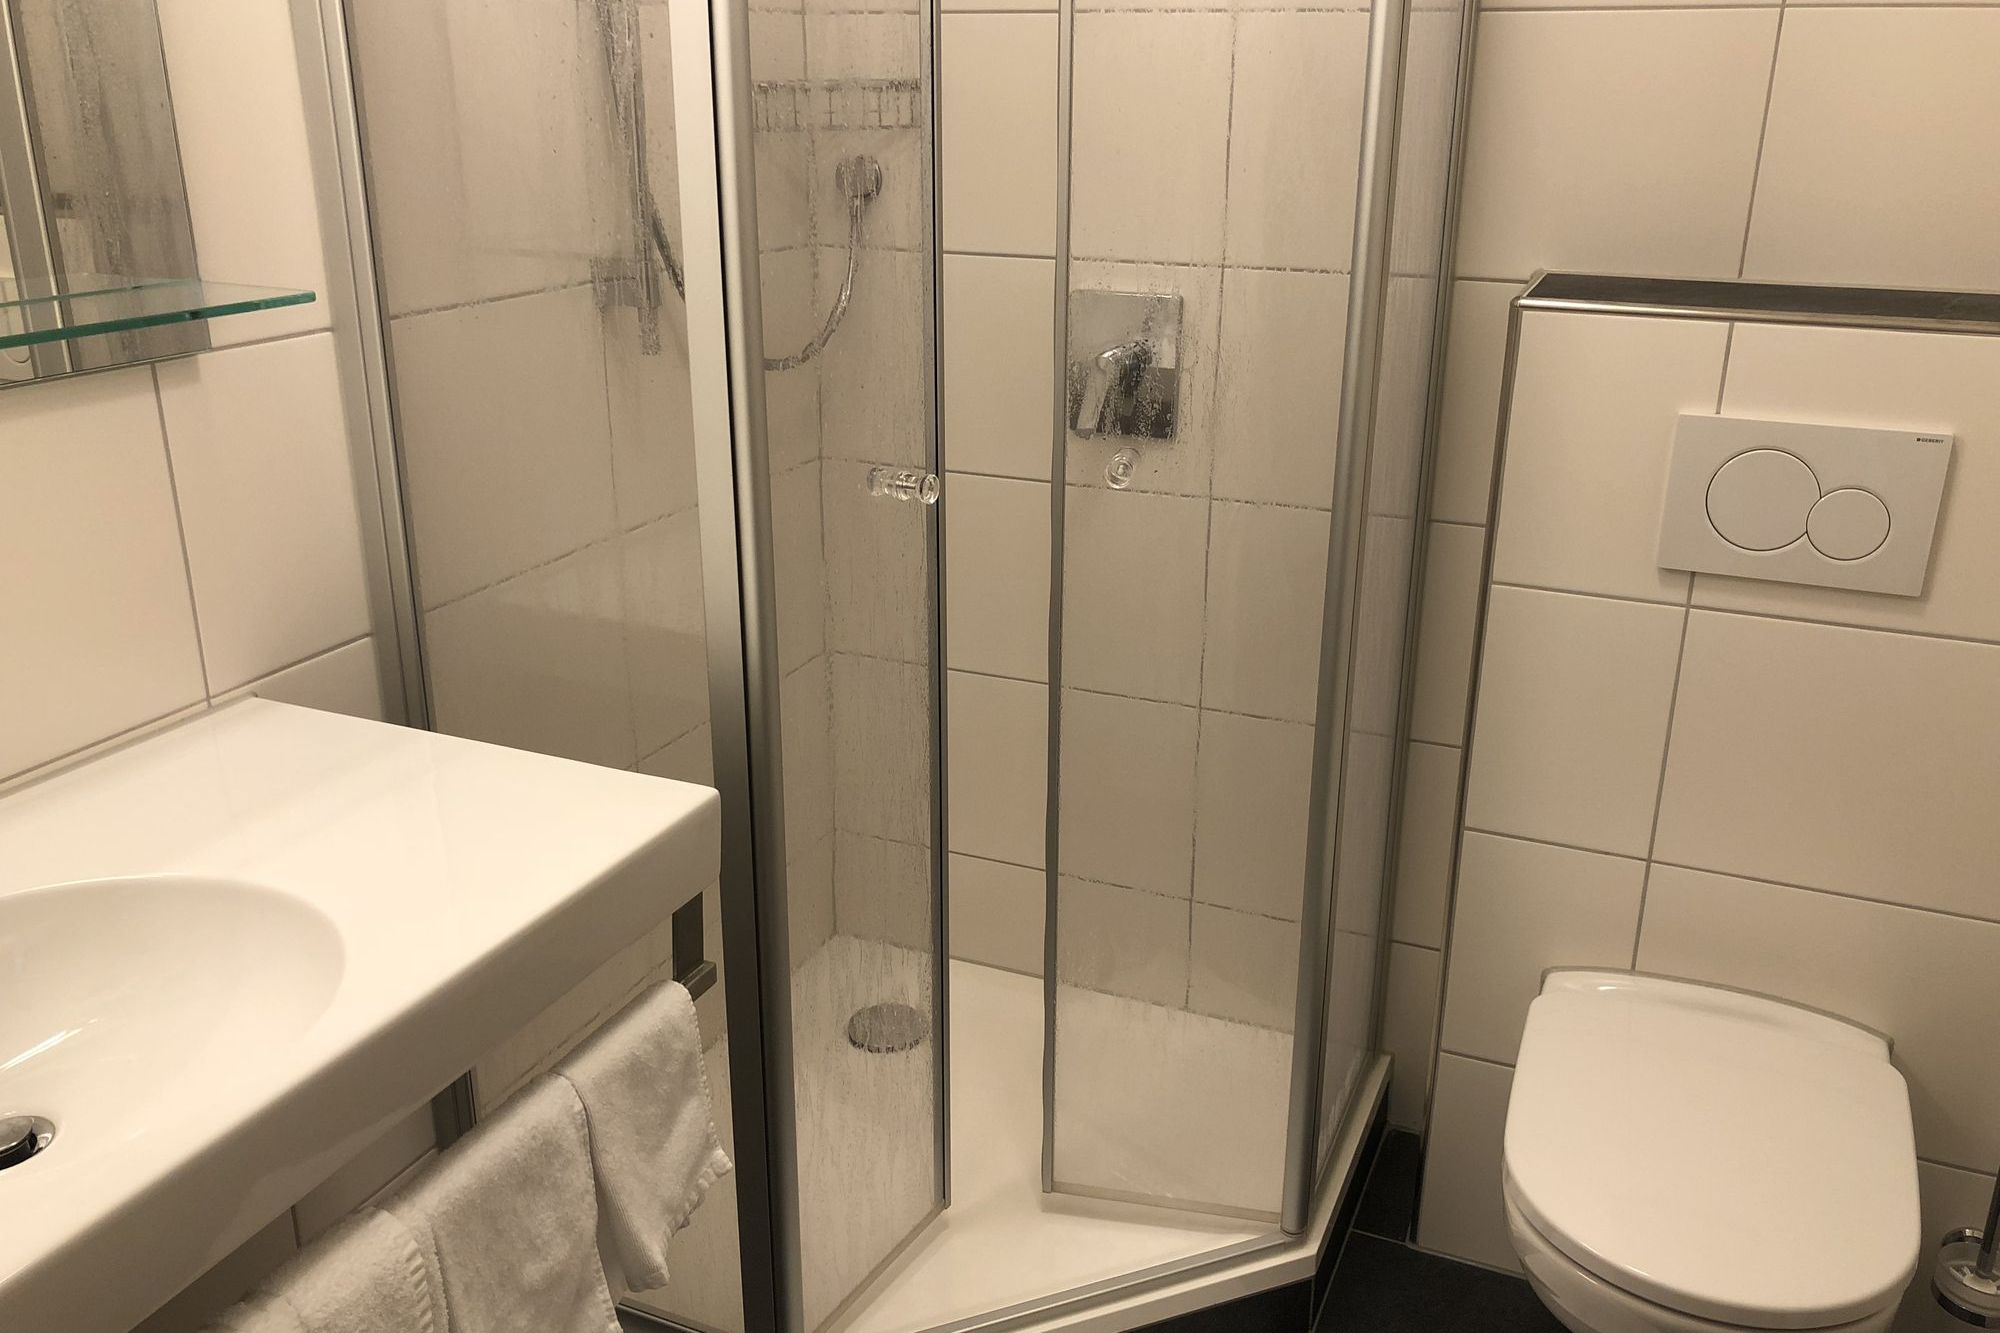 http://www.hotelbinder.de/wp-content/uploads/doppelzimmer1_4.jpg